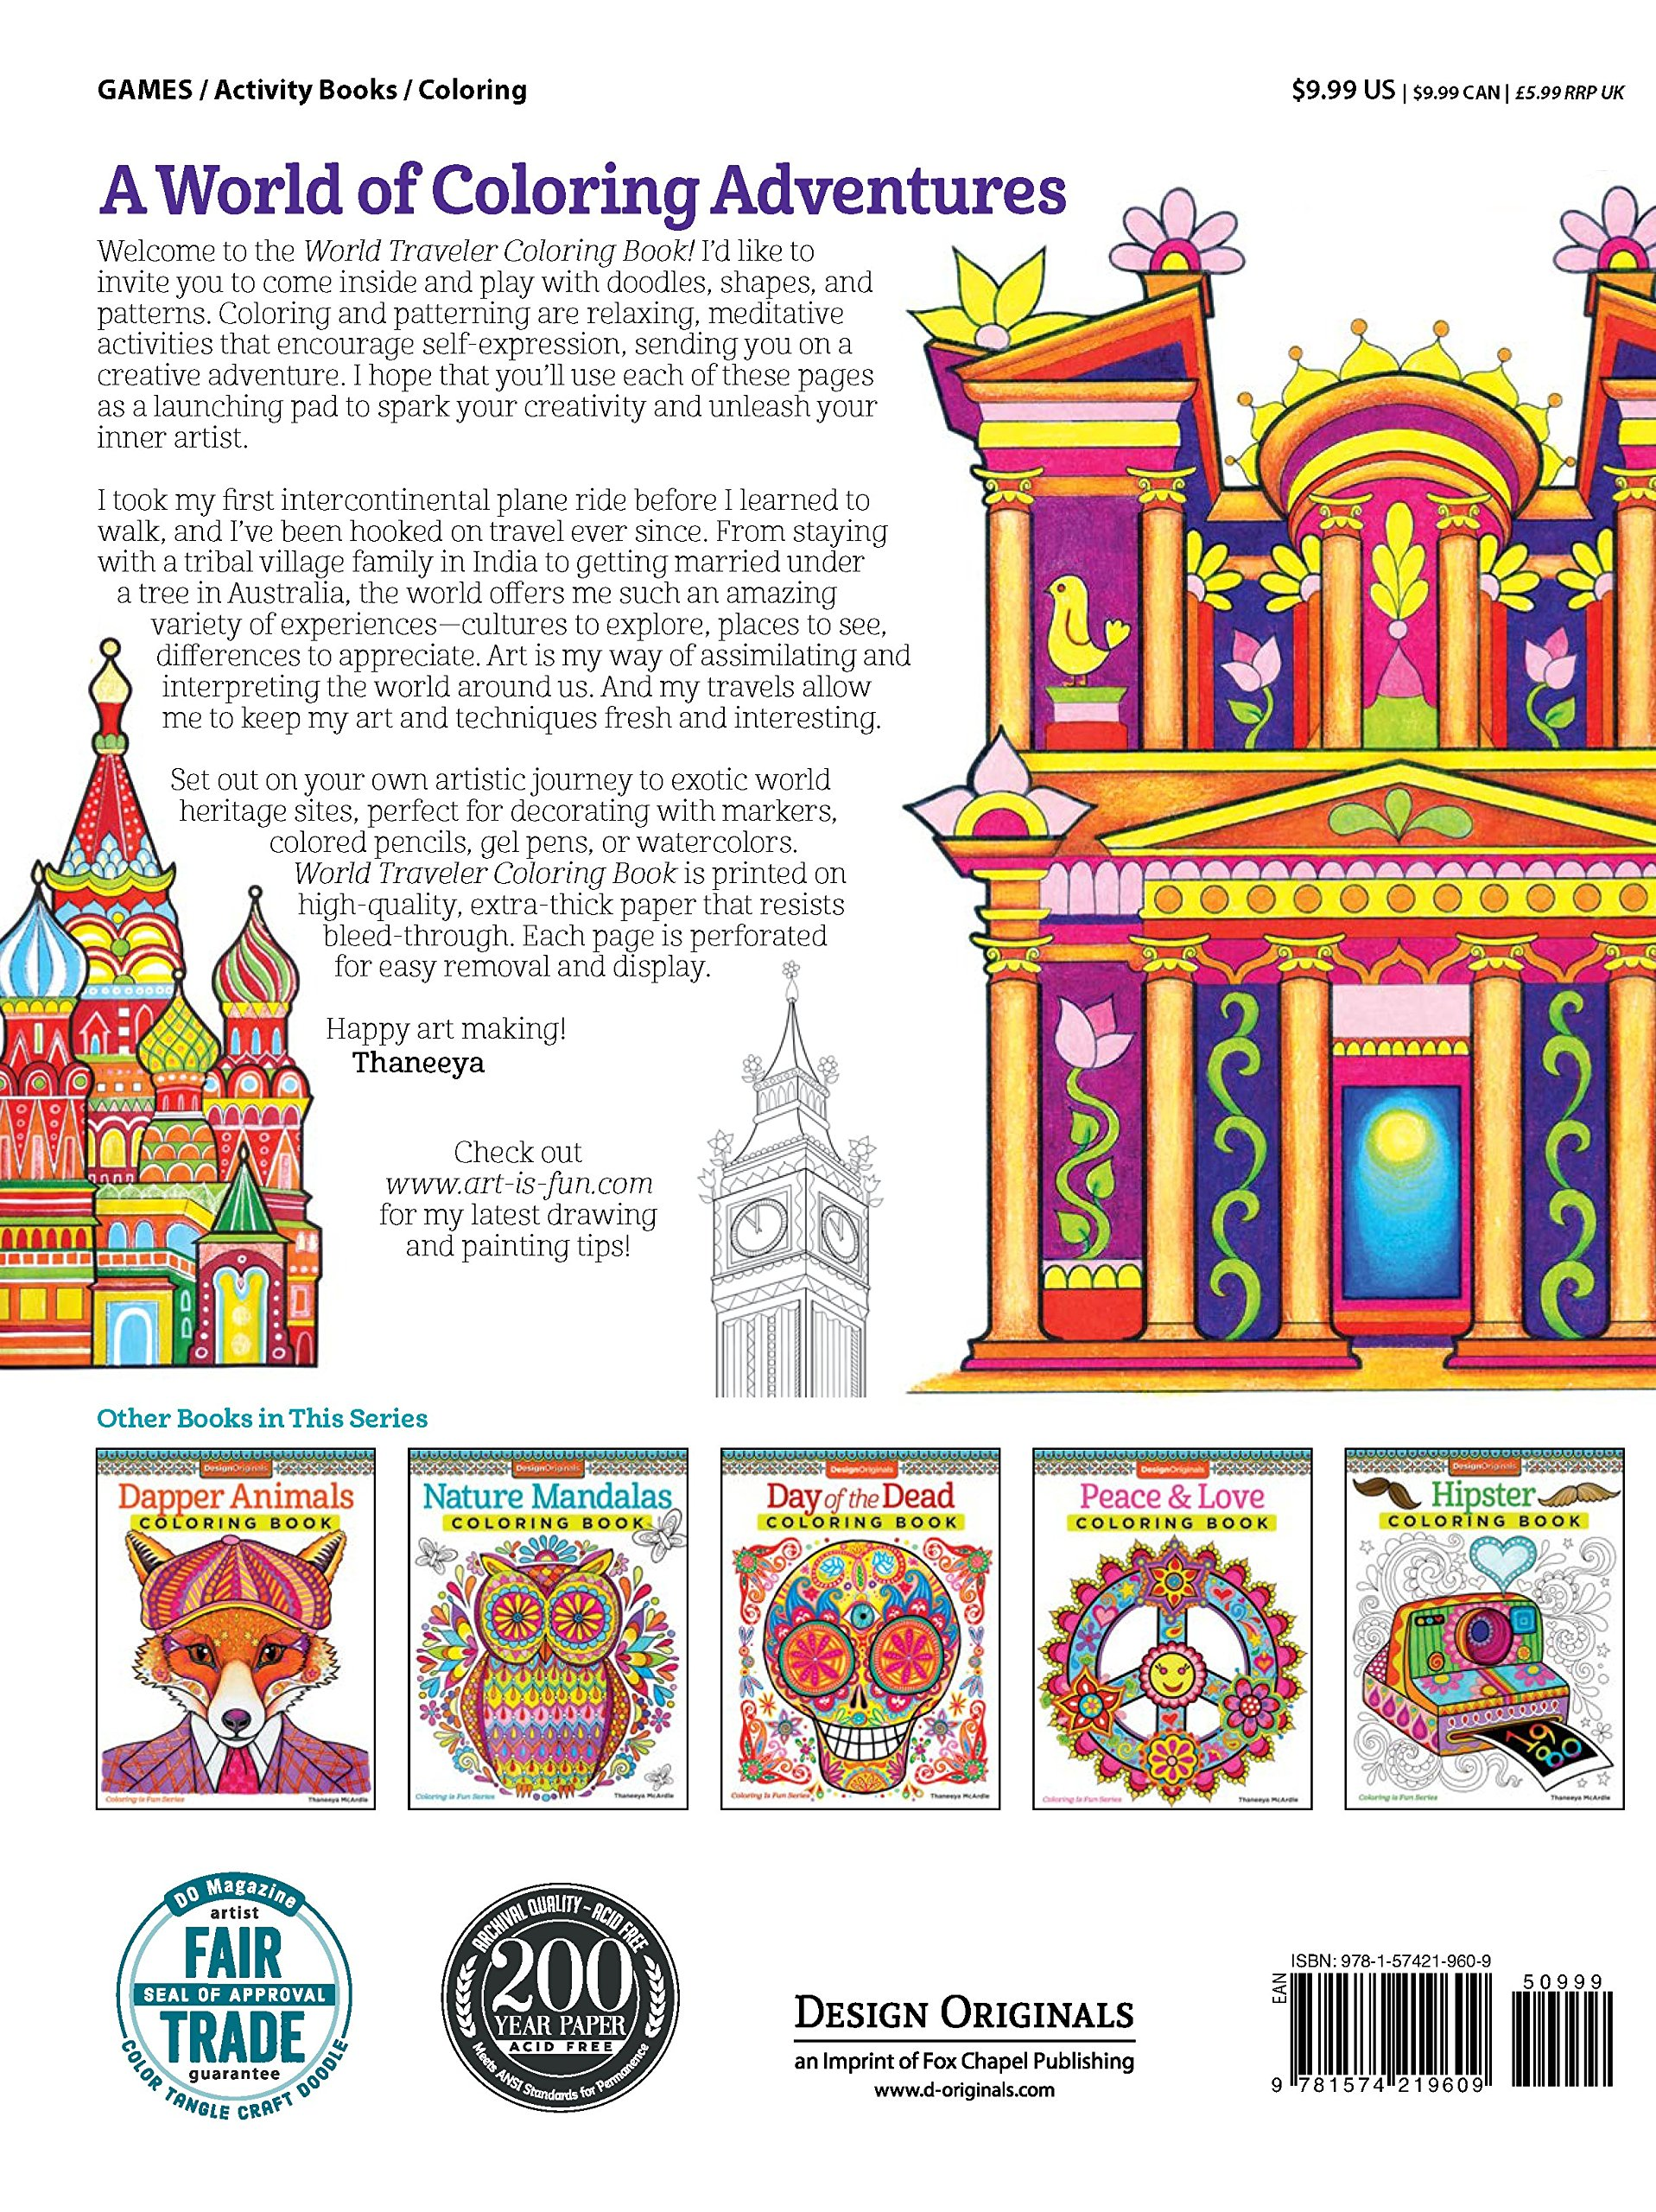 World Traveler Coloring Book 30 Heritage Sites Design Originals Thaneeya McArdle 0499995279728 Amazon Books